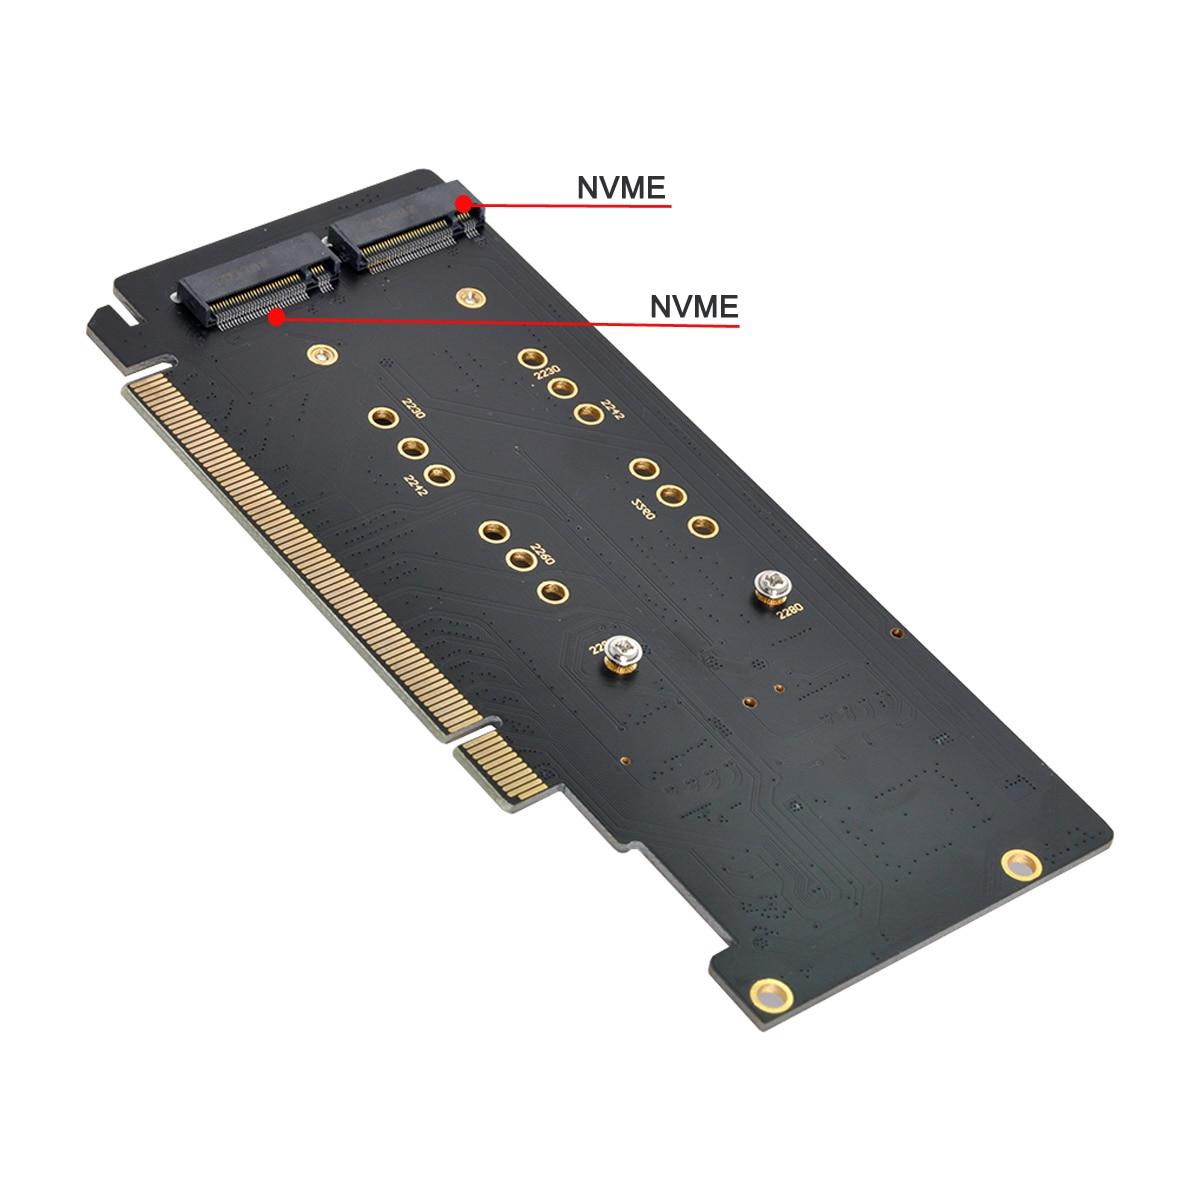 4X NVME M.2 AHCI to PCIE Express 3.0 Gen3 X16 بطاقة مداهمة VROC Raid0 محول هايبر